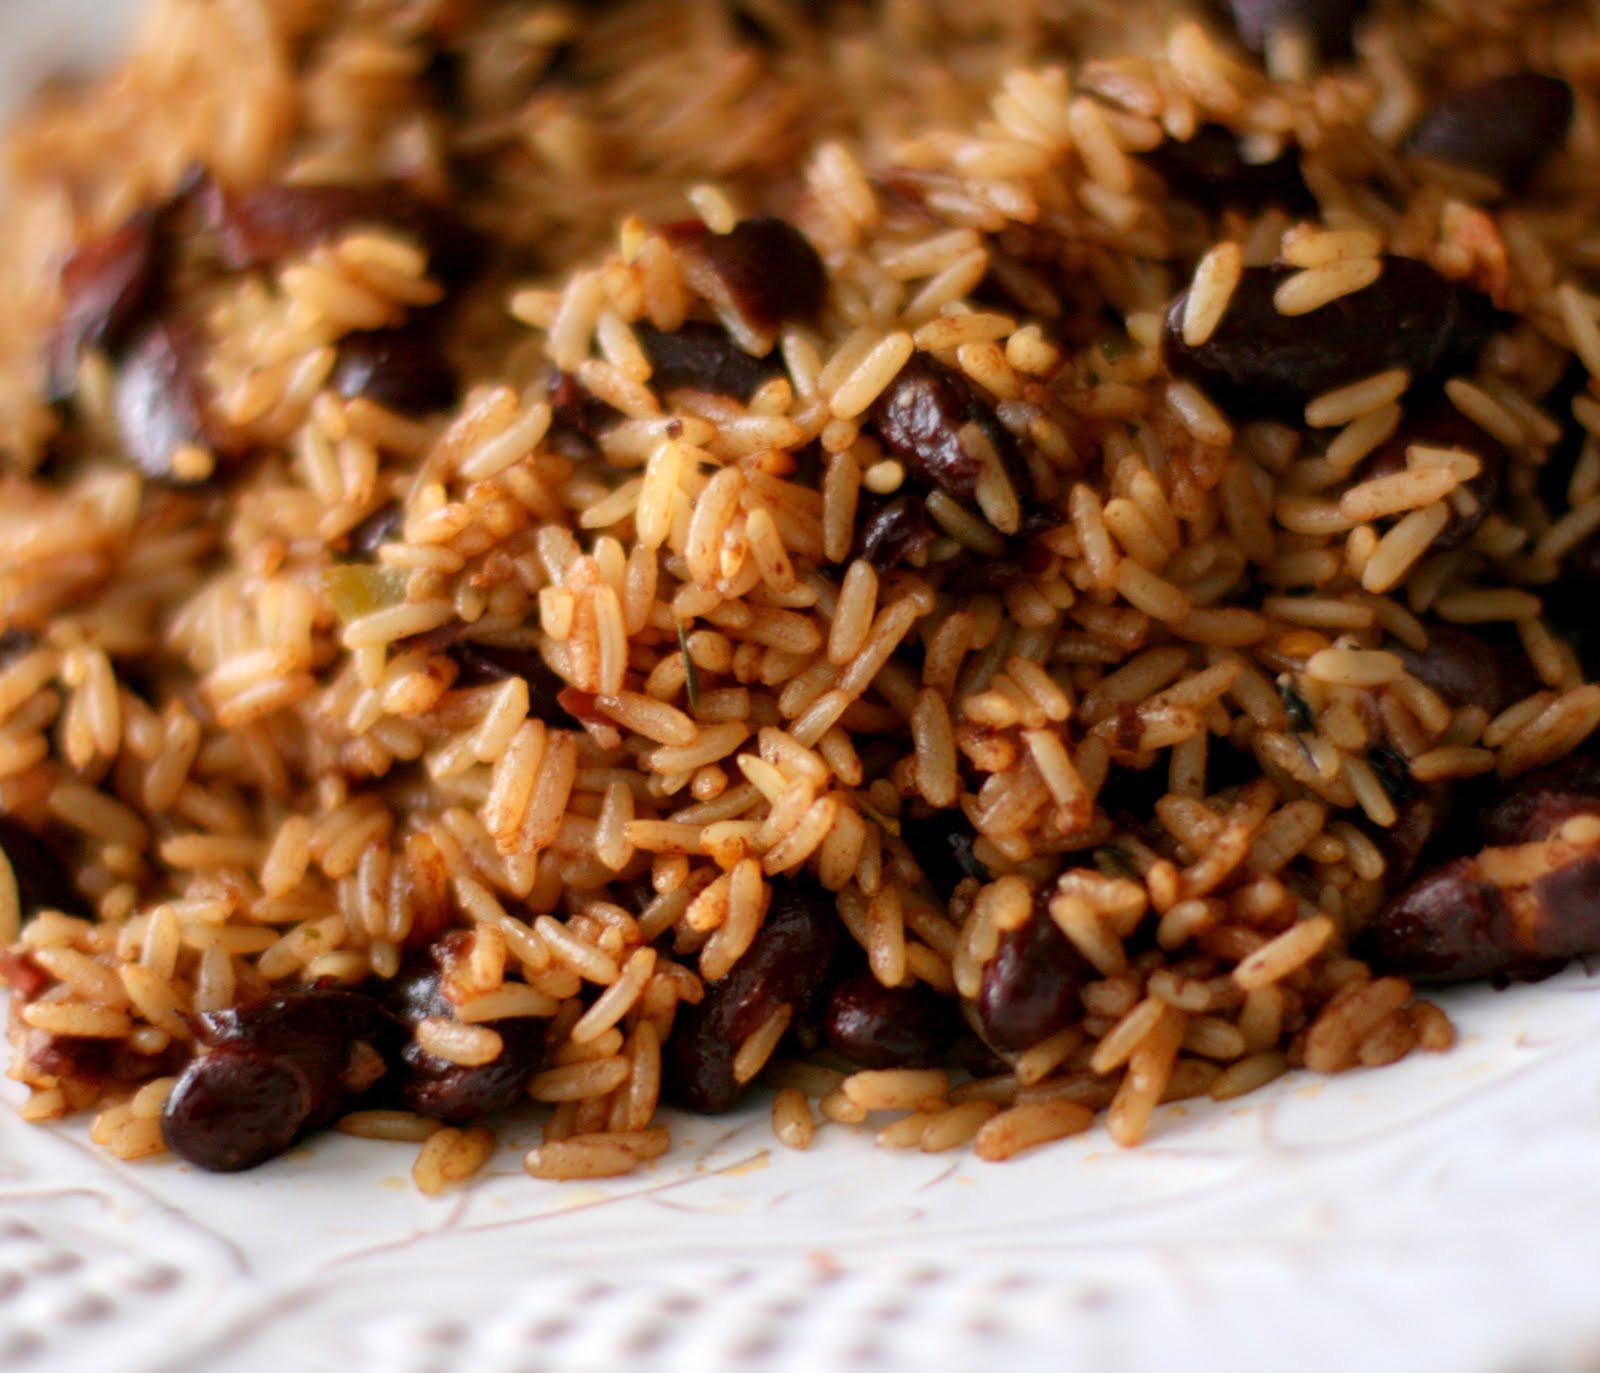 Haitian Rice And Beans  QlinArt April 2010